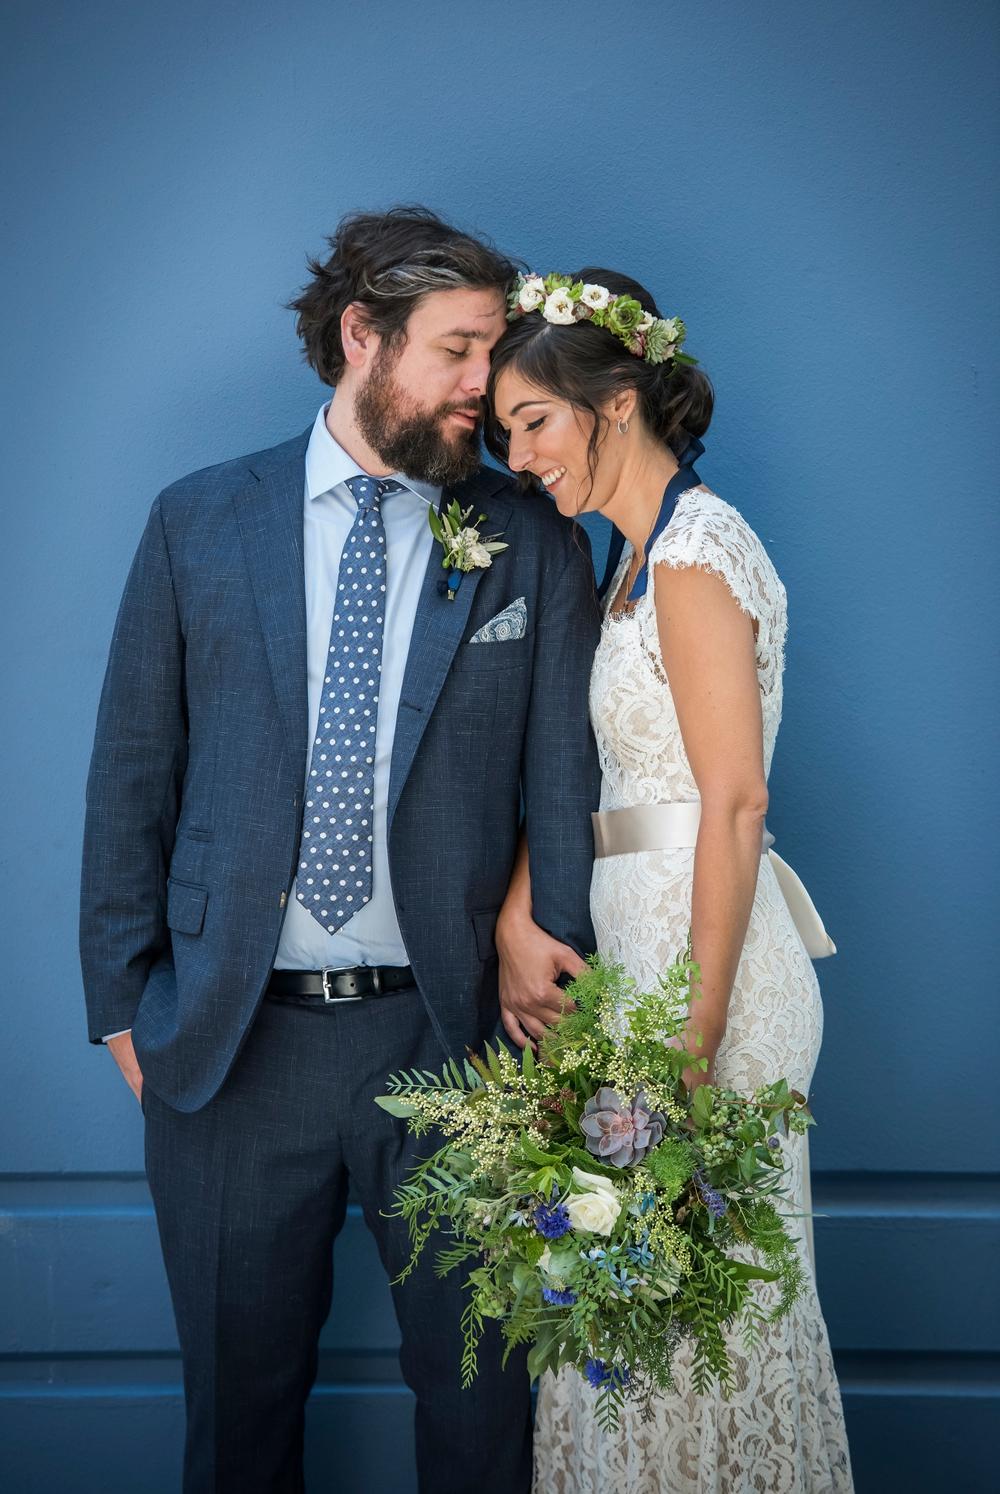 PNW-ferns-at-fremont-foundry-wedding-florist 7.jpg